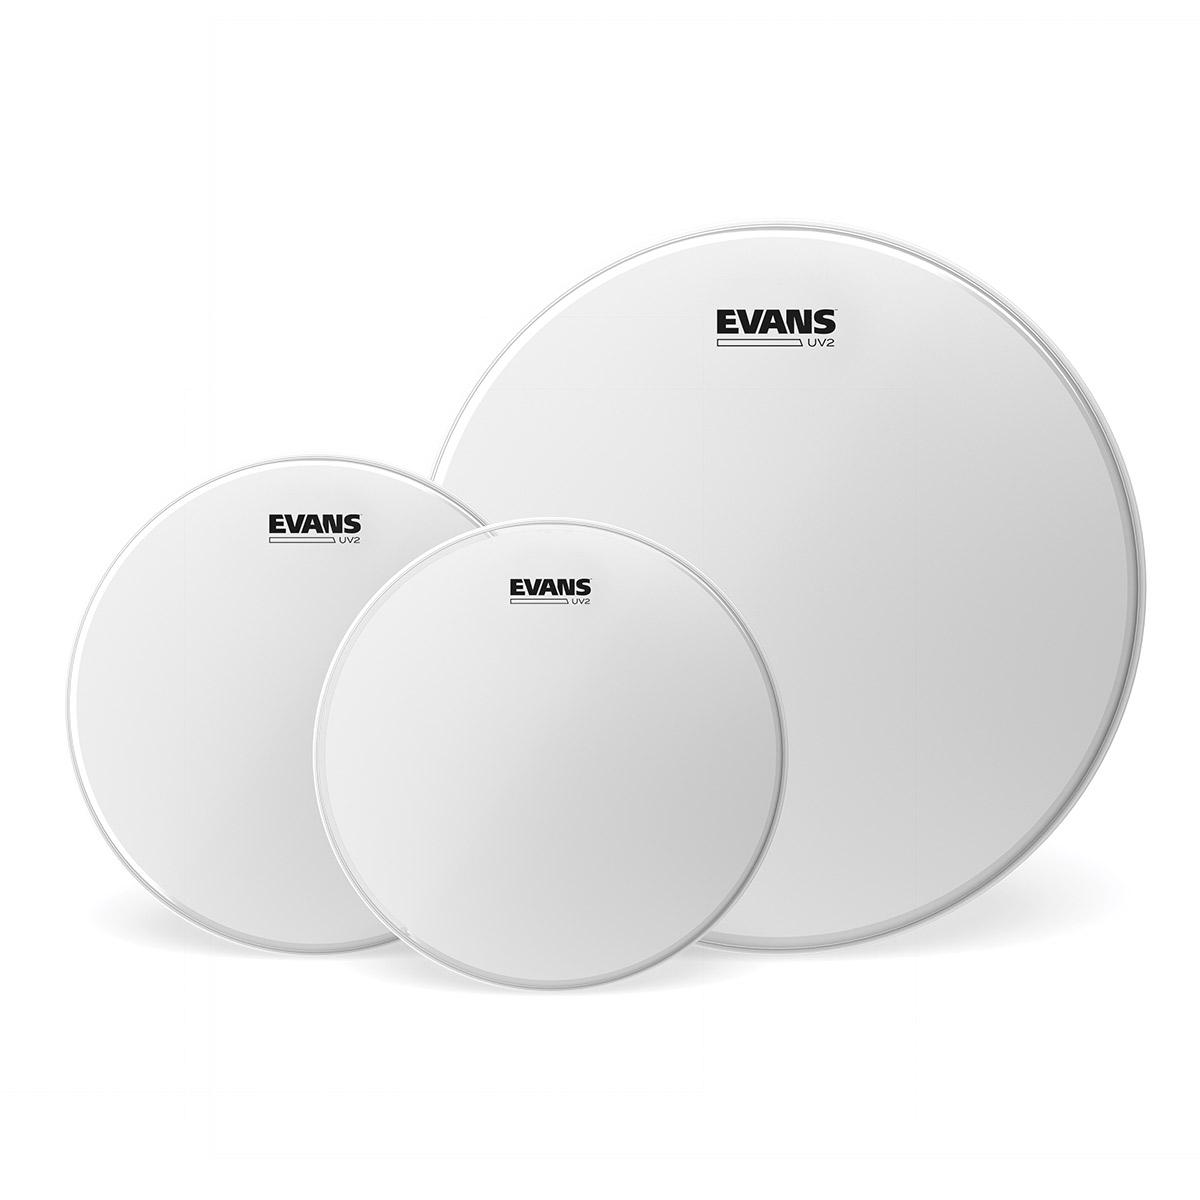 EVANS ETP-UV2-R ROCK ドラムヘッドパック 10/12/16インチ 【エバンス TOMPACK UV2 CTD】